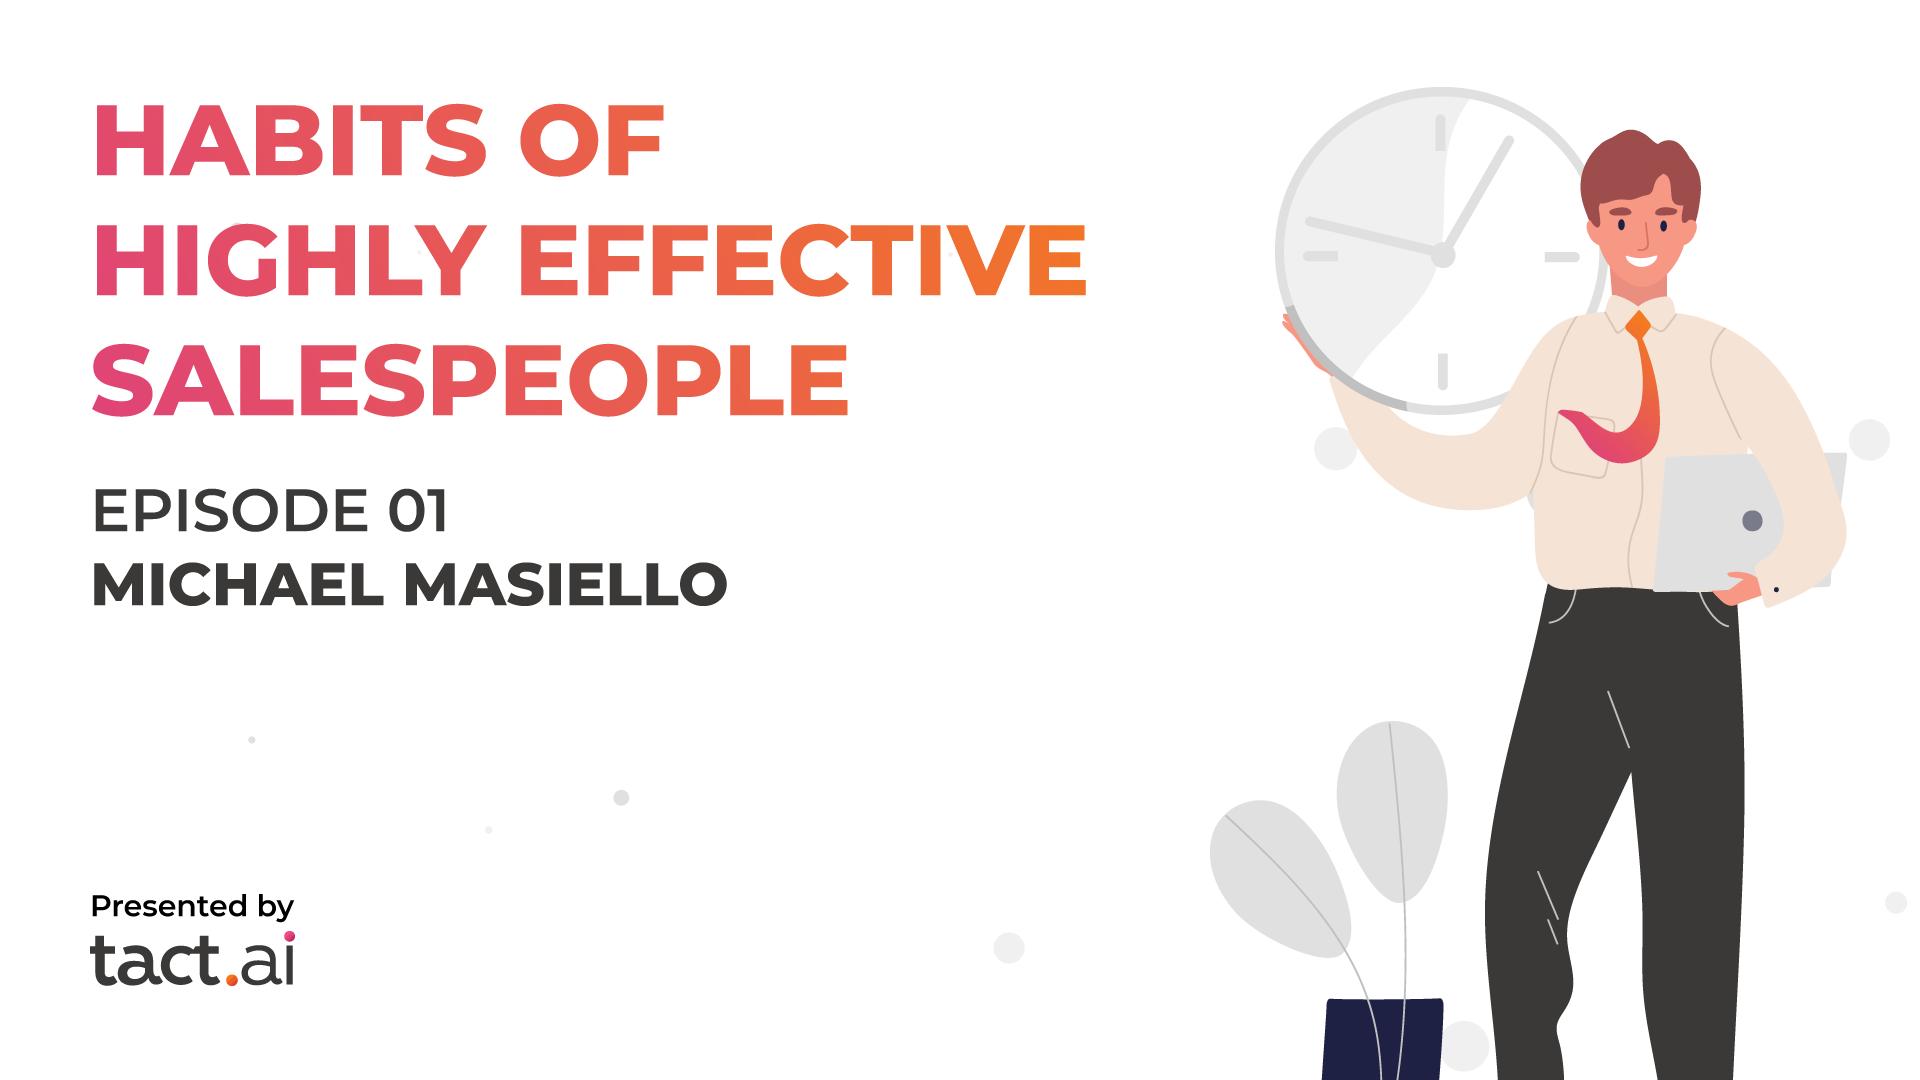 Habits of Highly Effective Salespeople - Michael Masiello - Episode 1